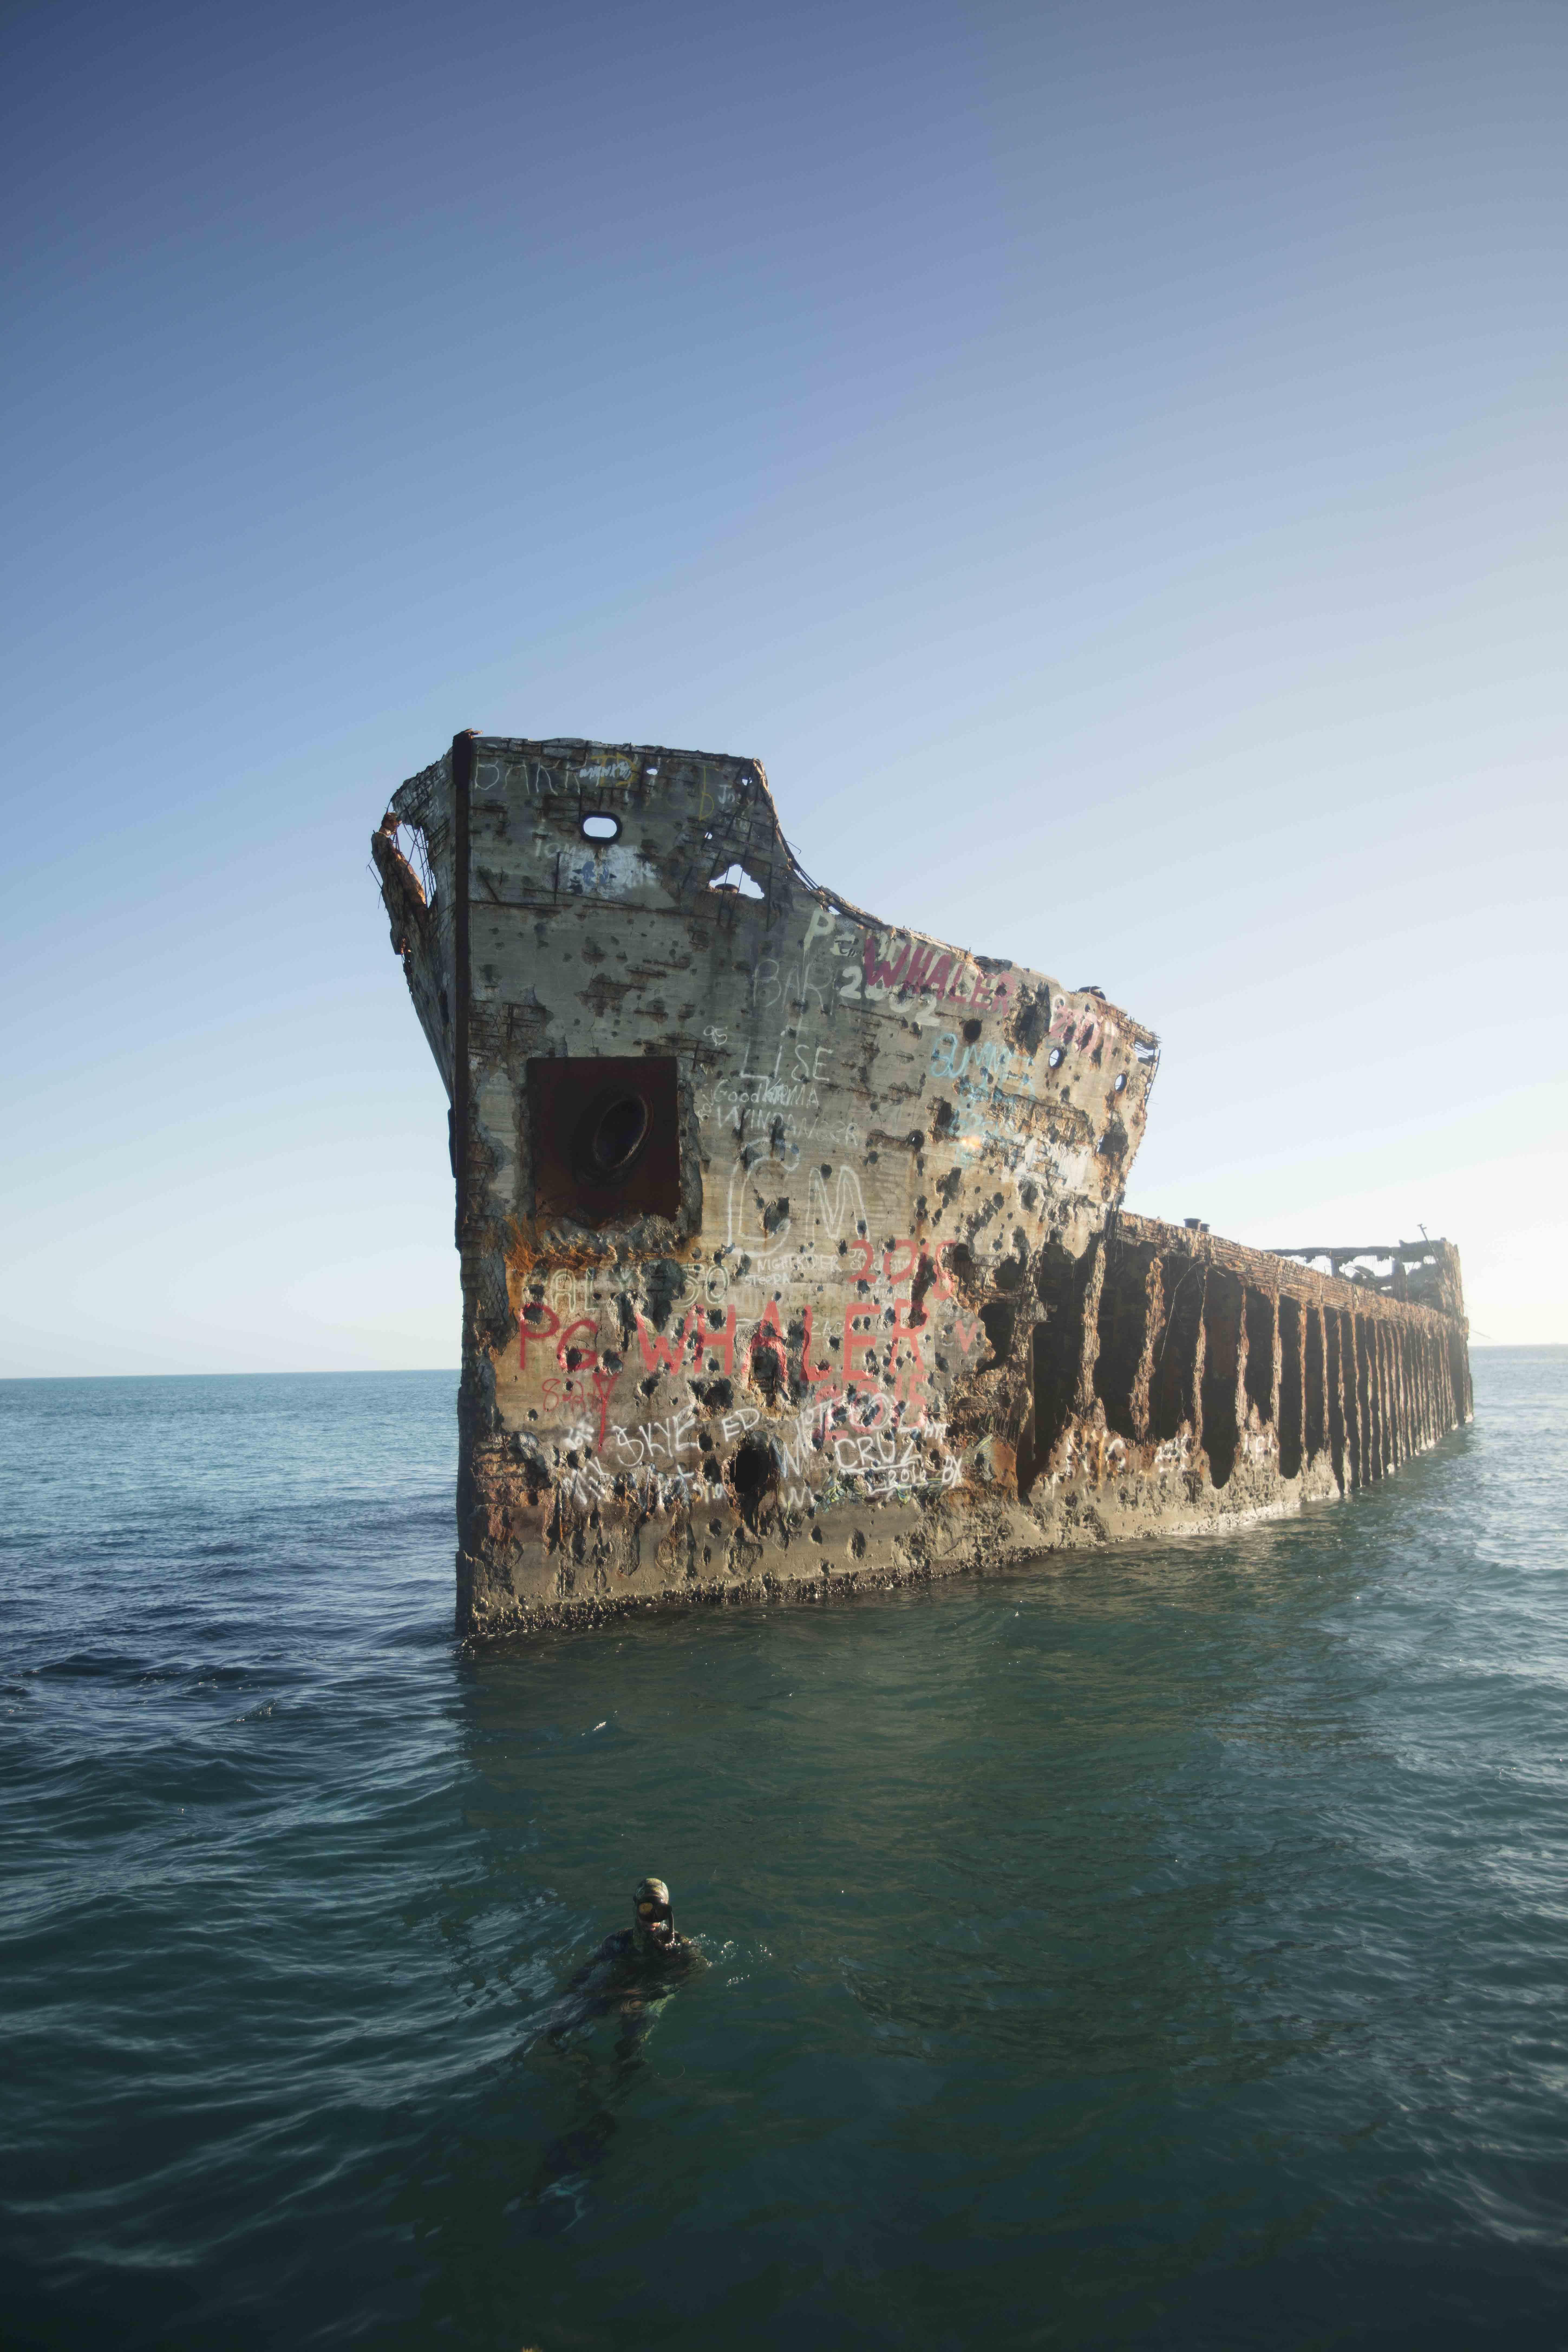 SS Sapona Bimini Padi scuba diving wreck